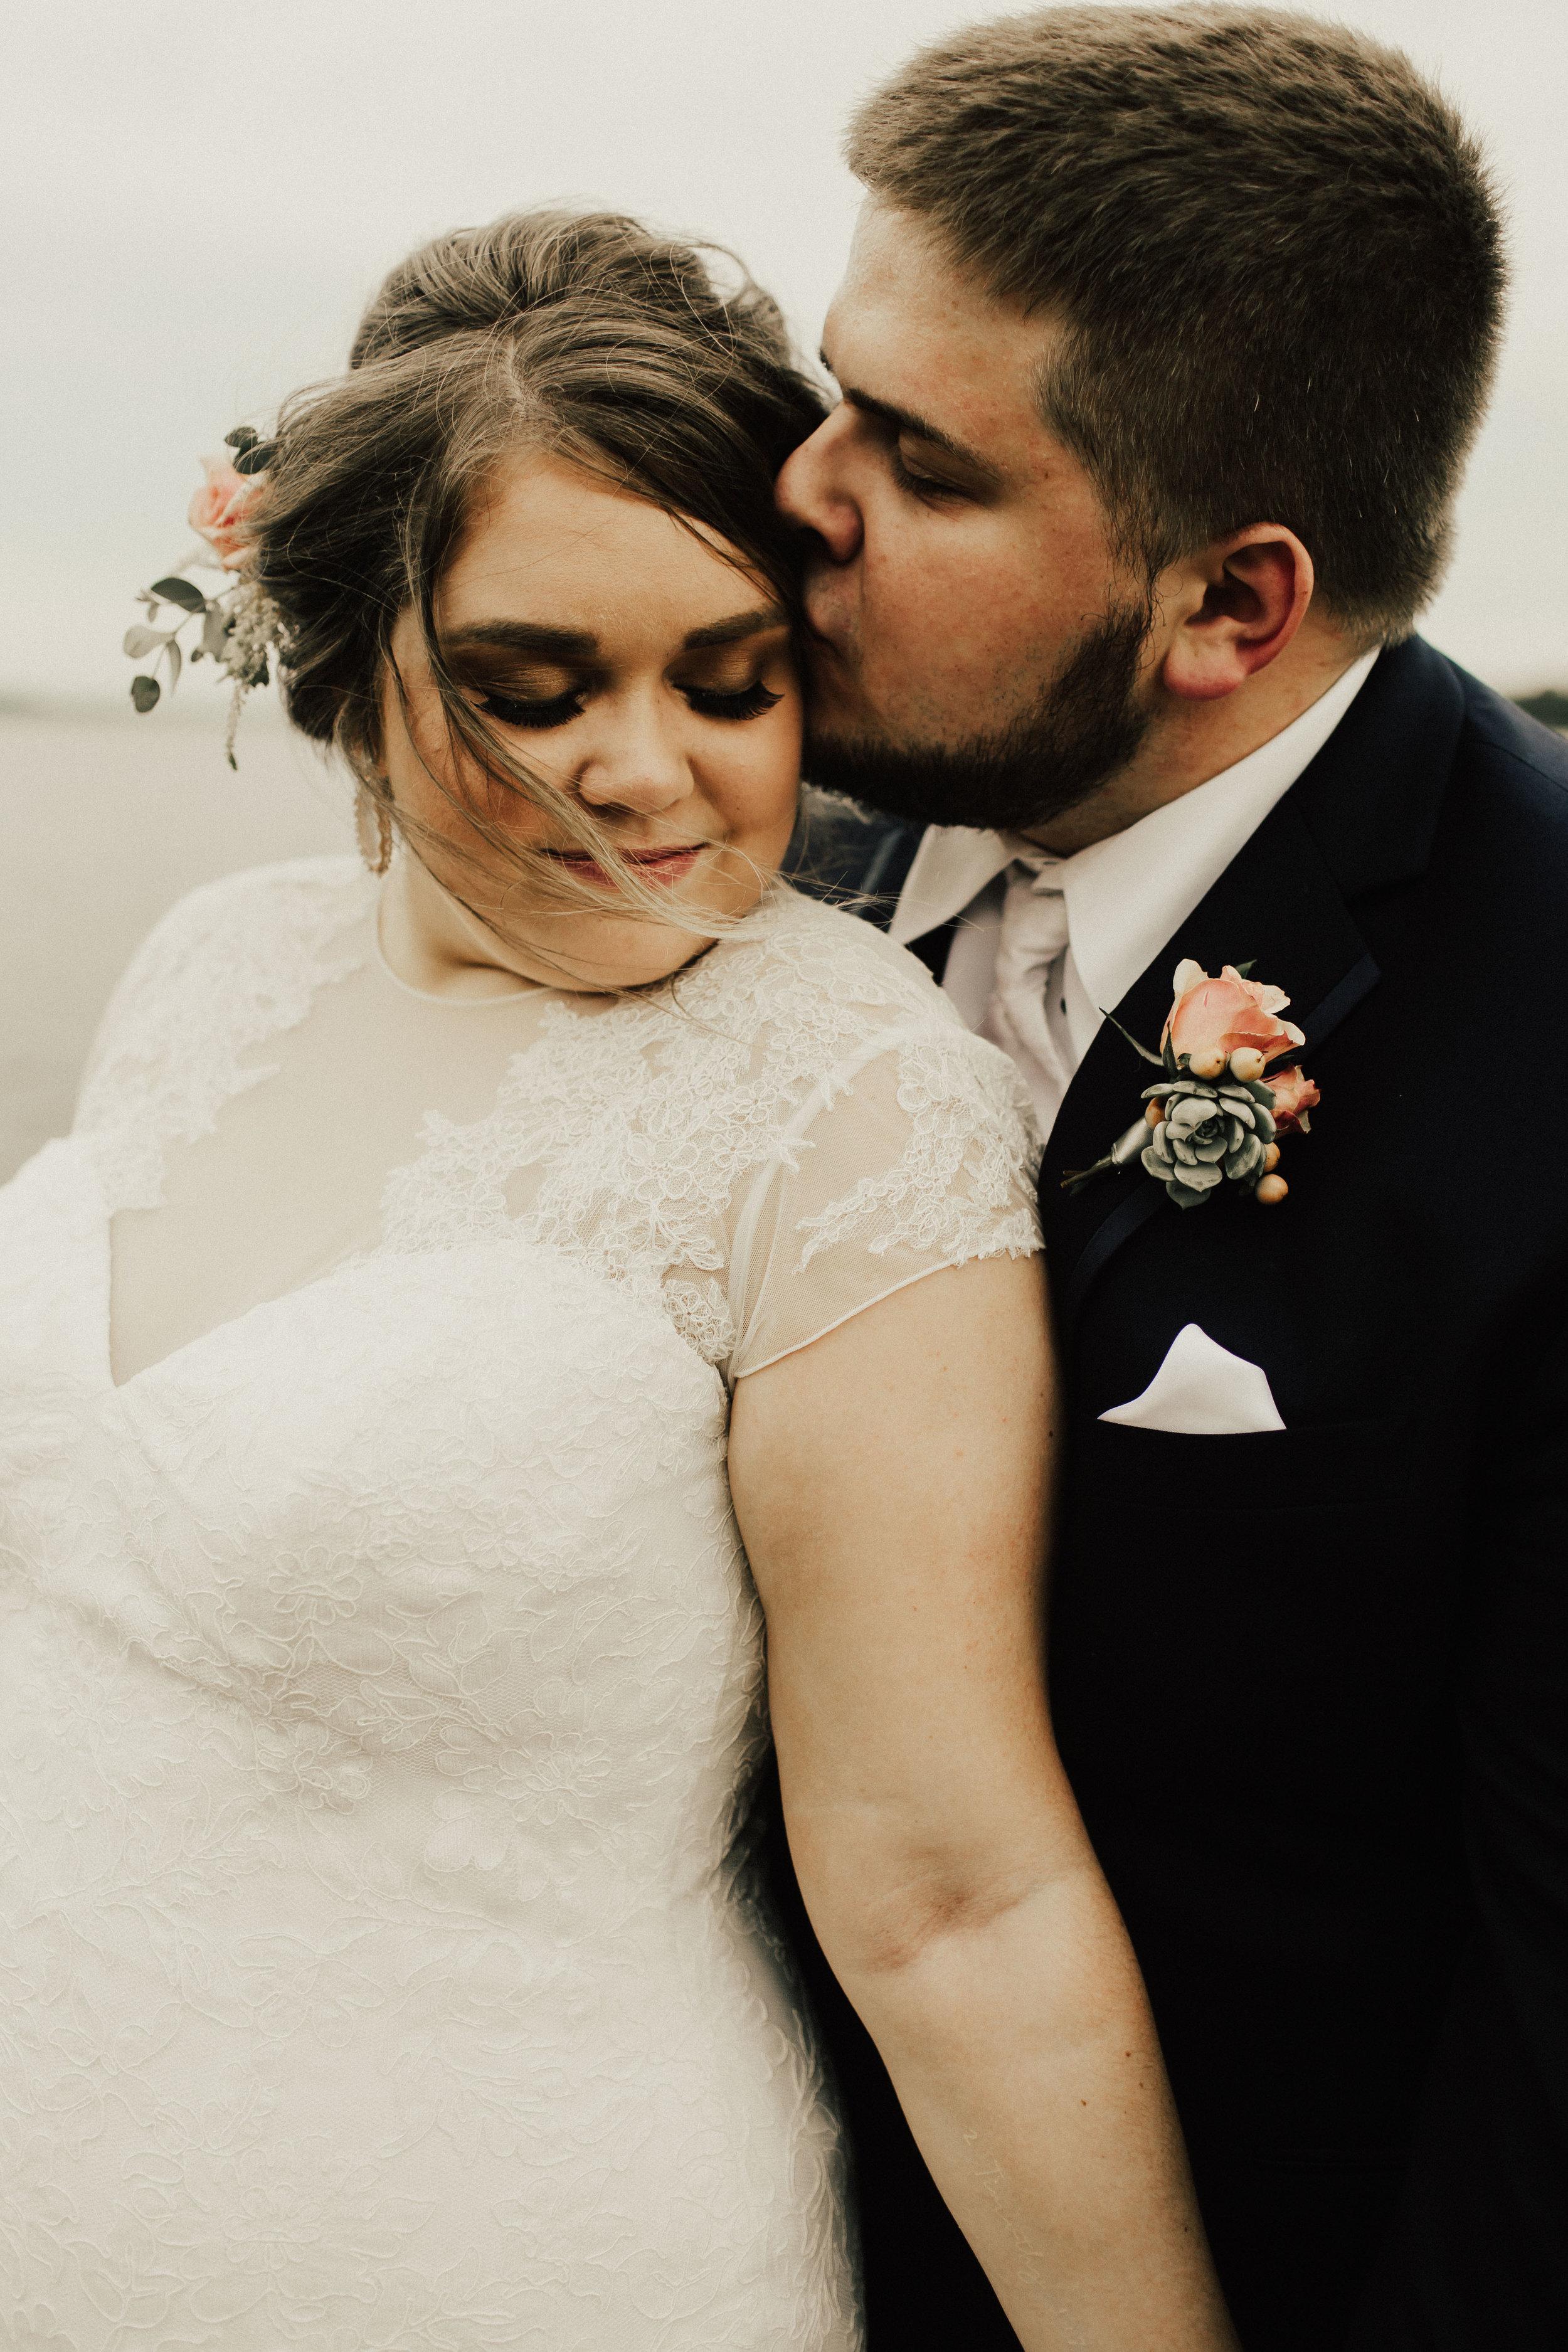 caitlin-jackson-wedding-photographer-lake-tyler-petroleum-club-texas--594.jpg